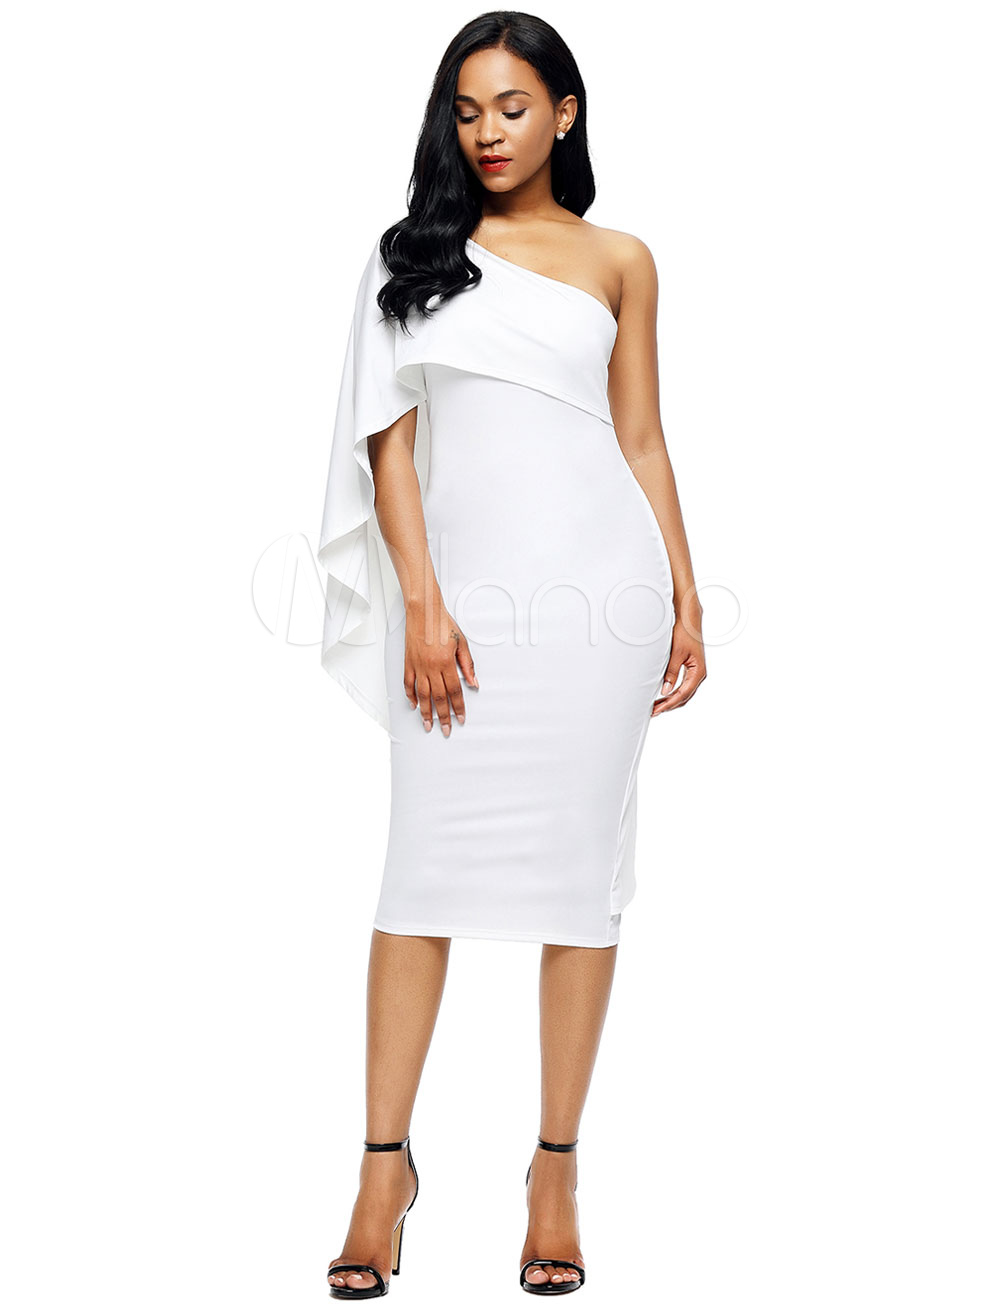 White Bodycon Dress One Shoulder Ruffles Sexy Women's Party Dresses (Women\\'s Clothing Bodycon Dresses) photo